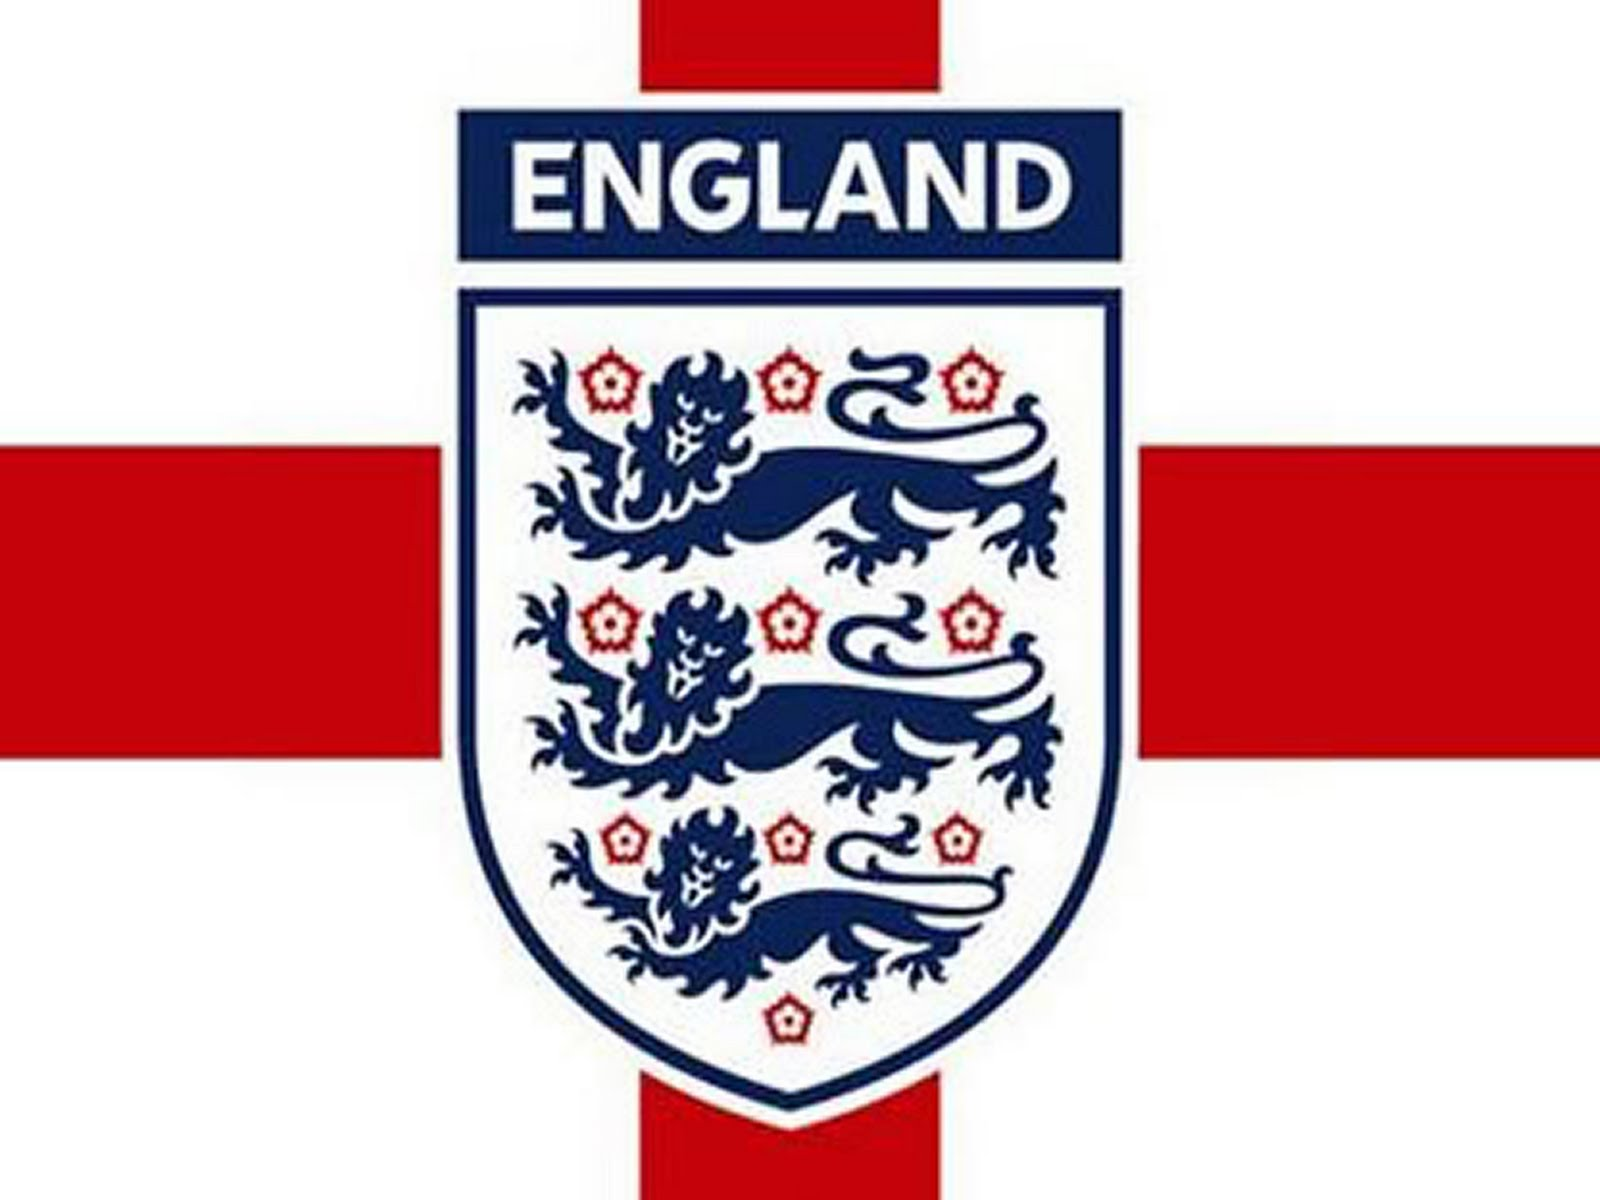 SOCCER PLAYERS WALLPAPER England Football Team World Cup 2010 1600x1200